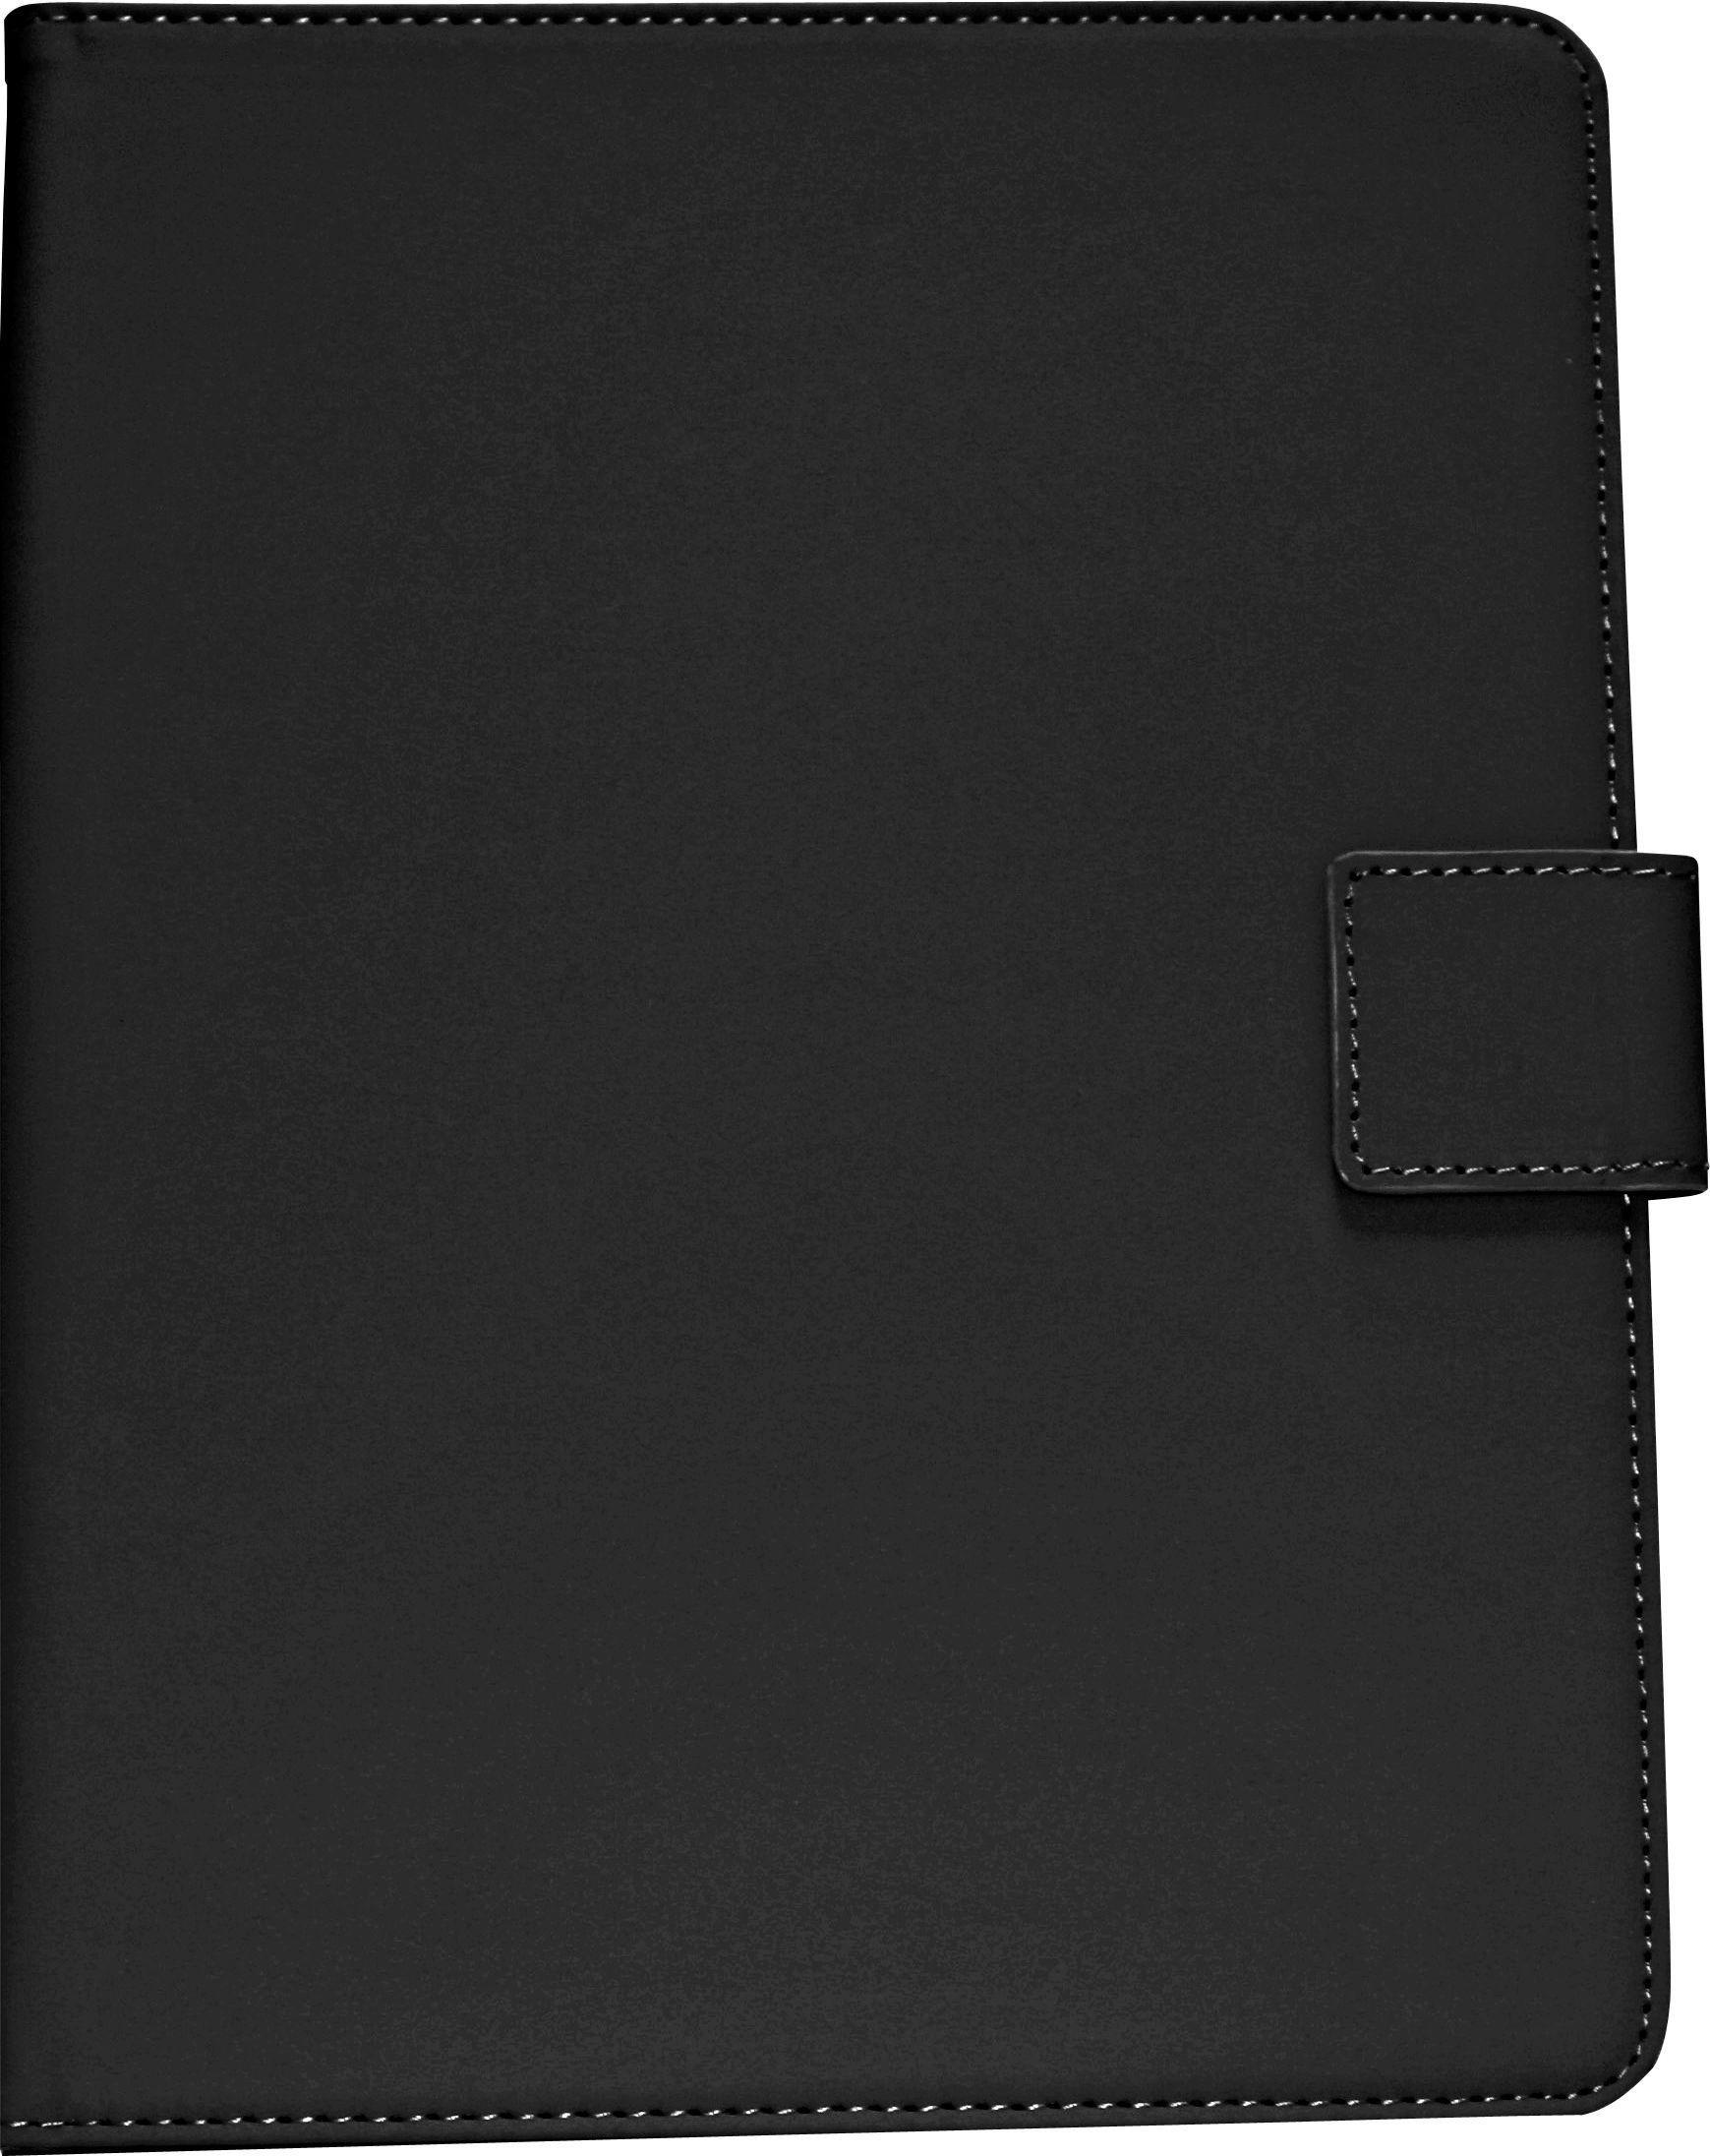 Universal - 7/8 Inch PVC Tablet Case - Black